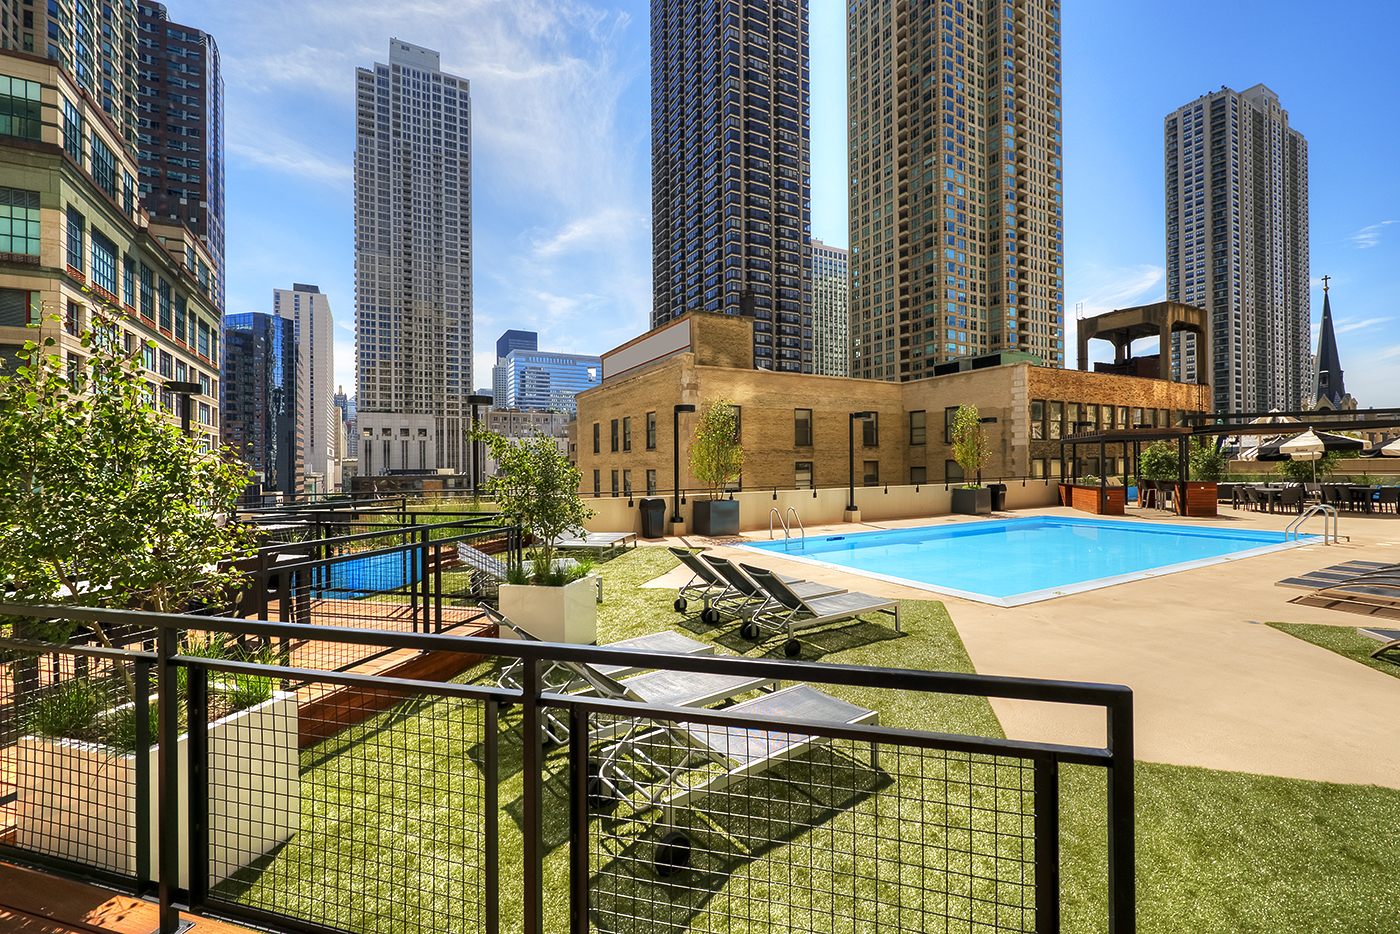 N Rush - Chicago luxury apartment